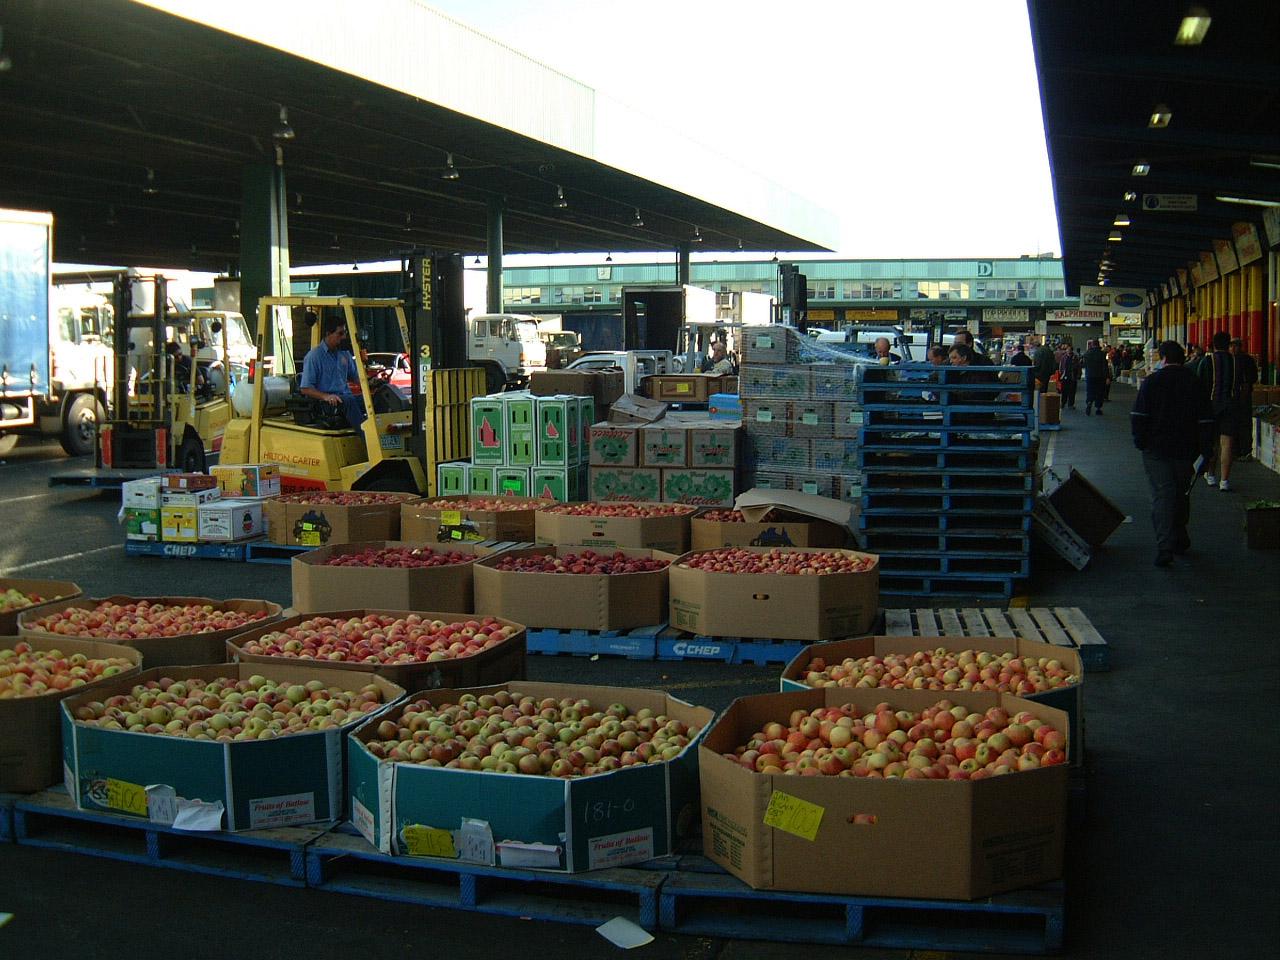 Brisbane Markets Sherwood Road Rocklea Queensland 4106 Jun 2002 I13